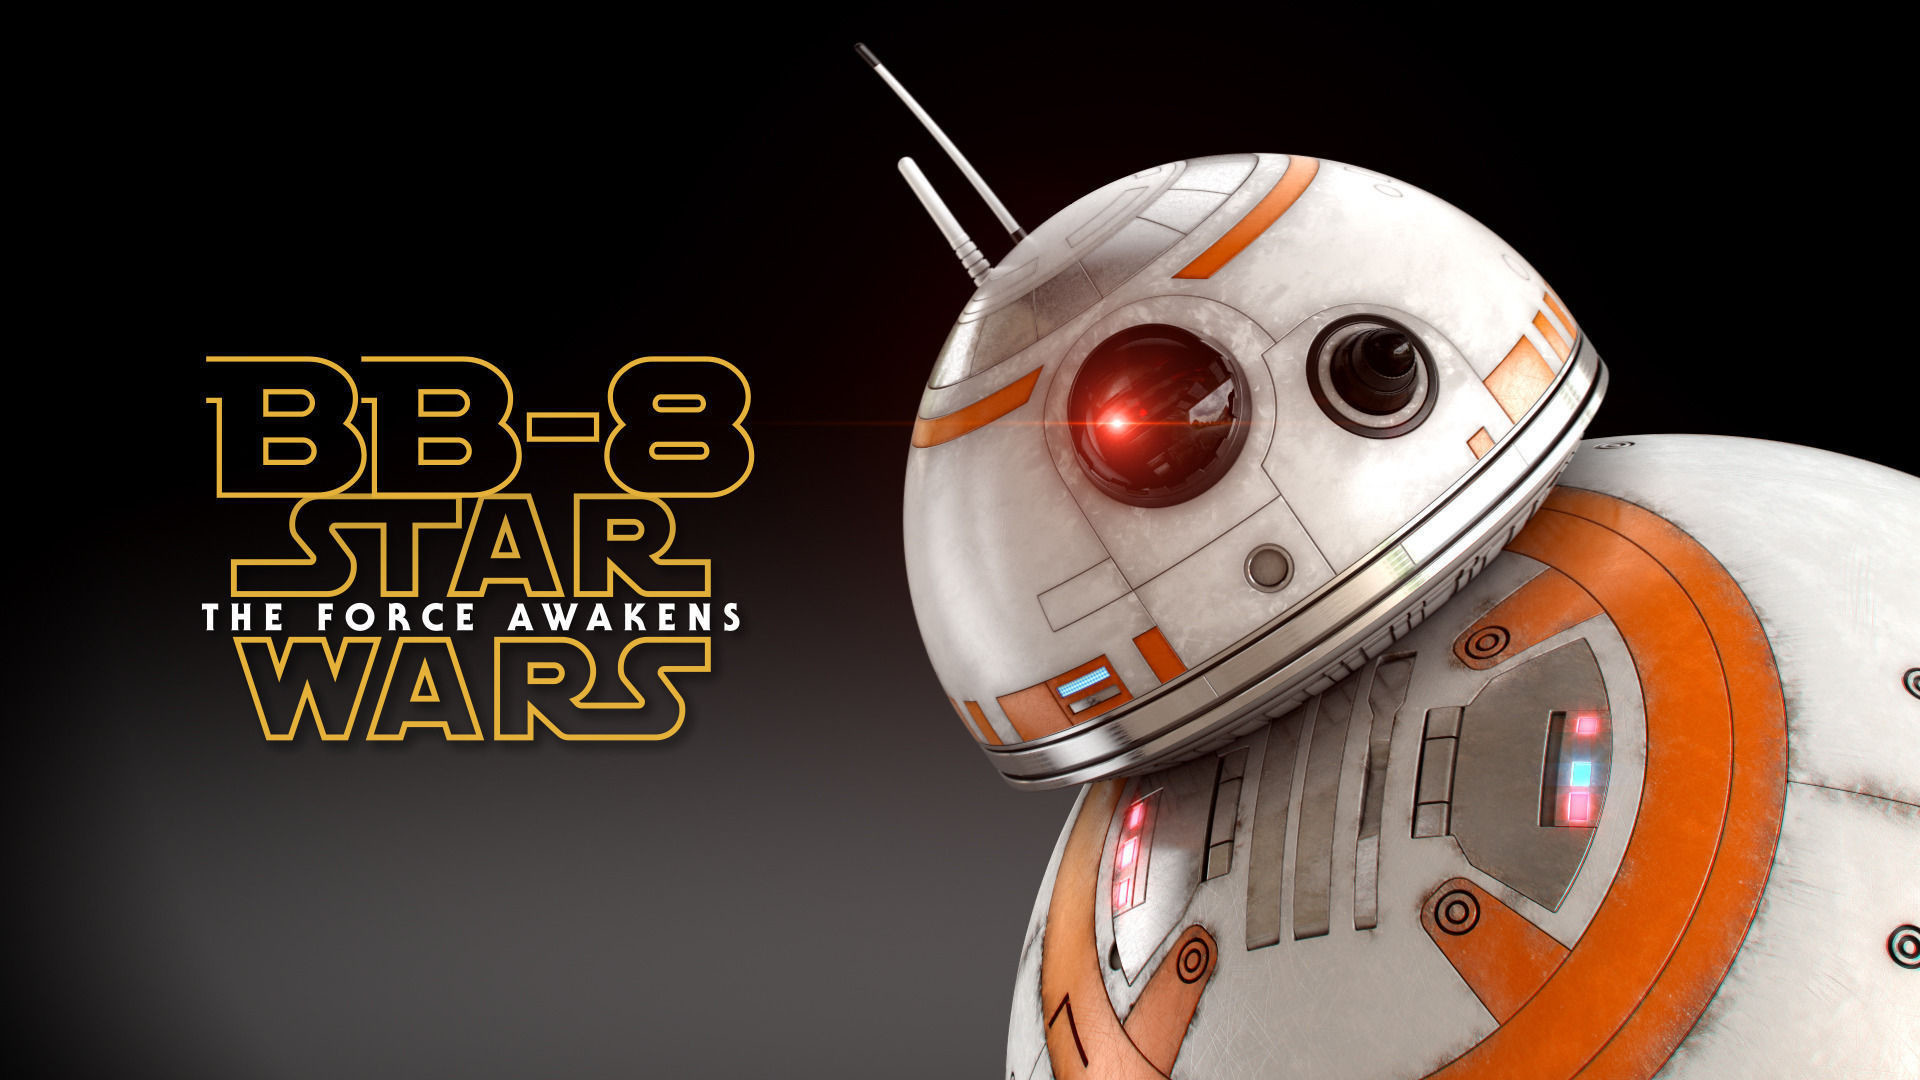 … bb-8 star wars droid full rigged 3d model rigged animated max obj fbx  3dm …